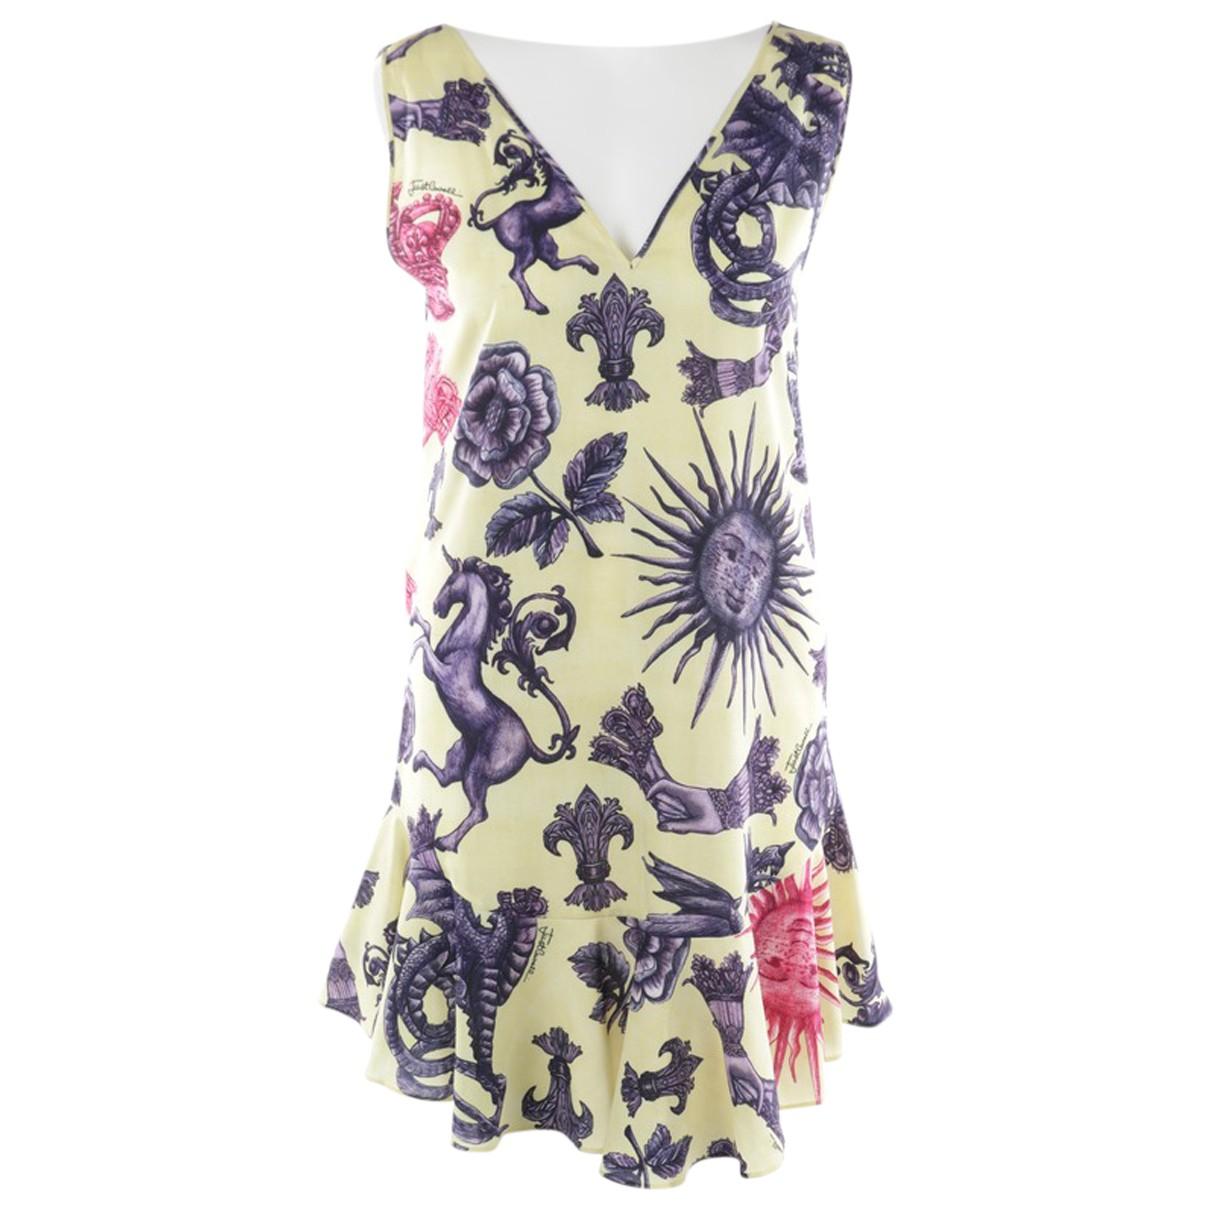 Just Cavalli N Yellow dress for Women 36 IT